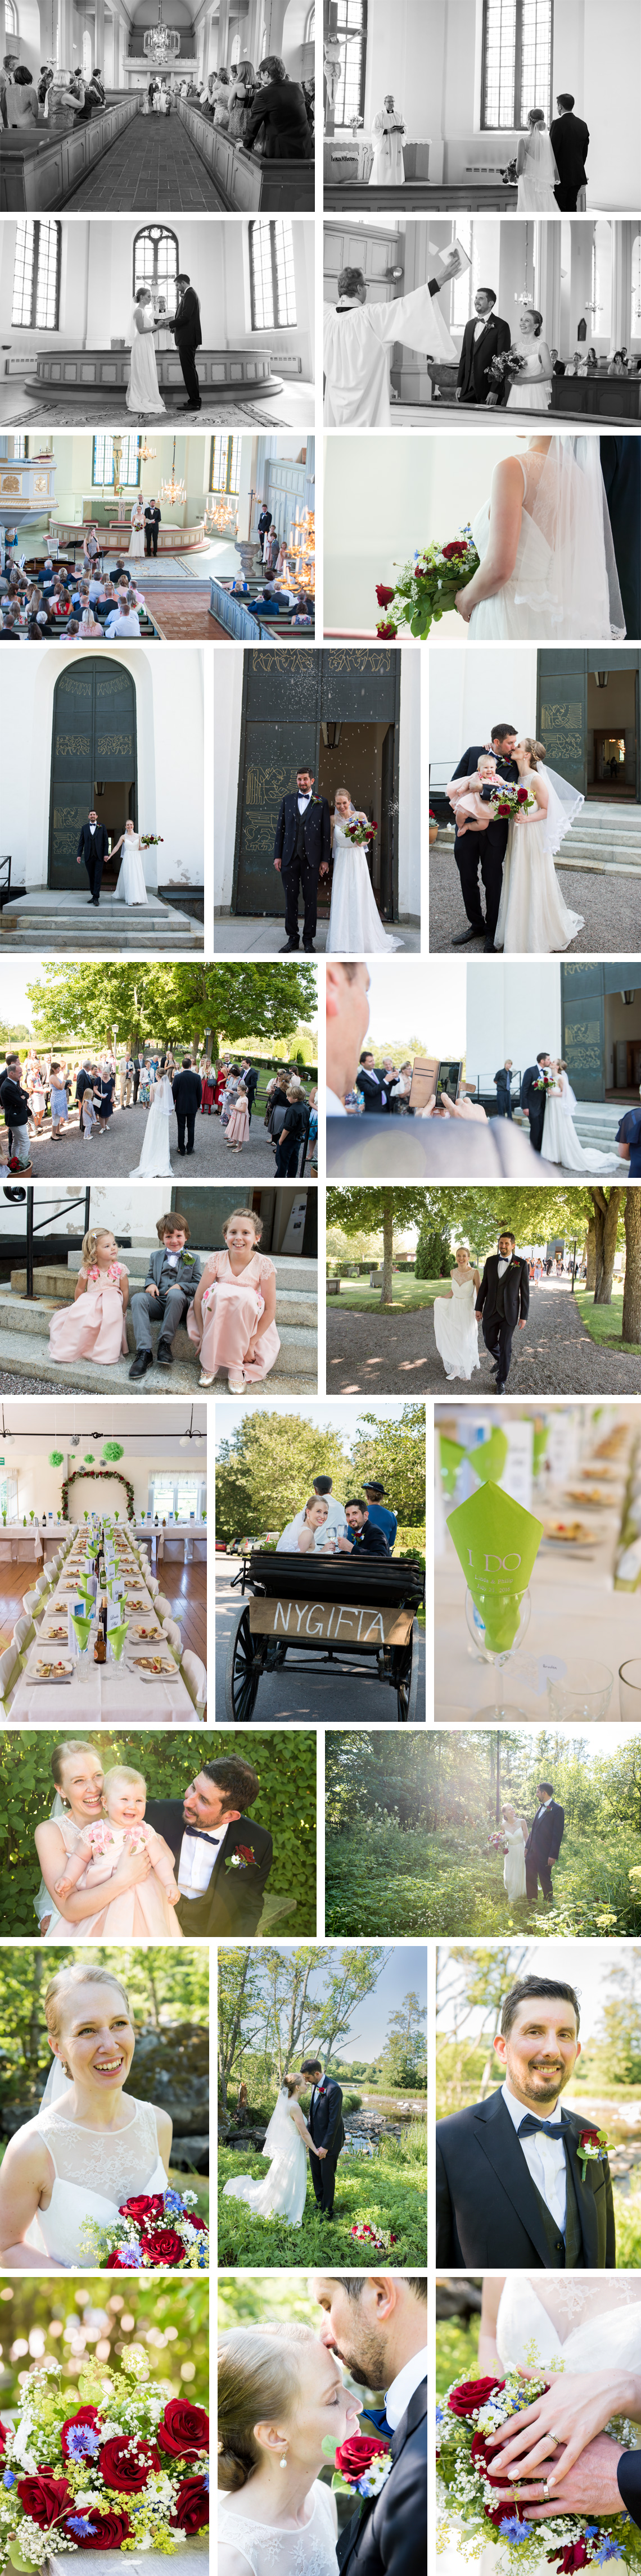 solosång i kyrkan bröllop